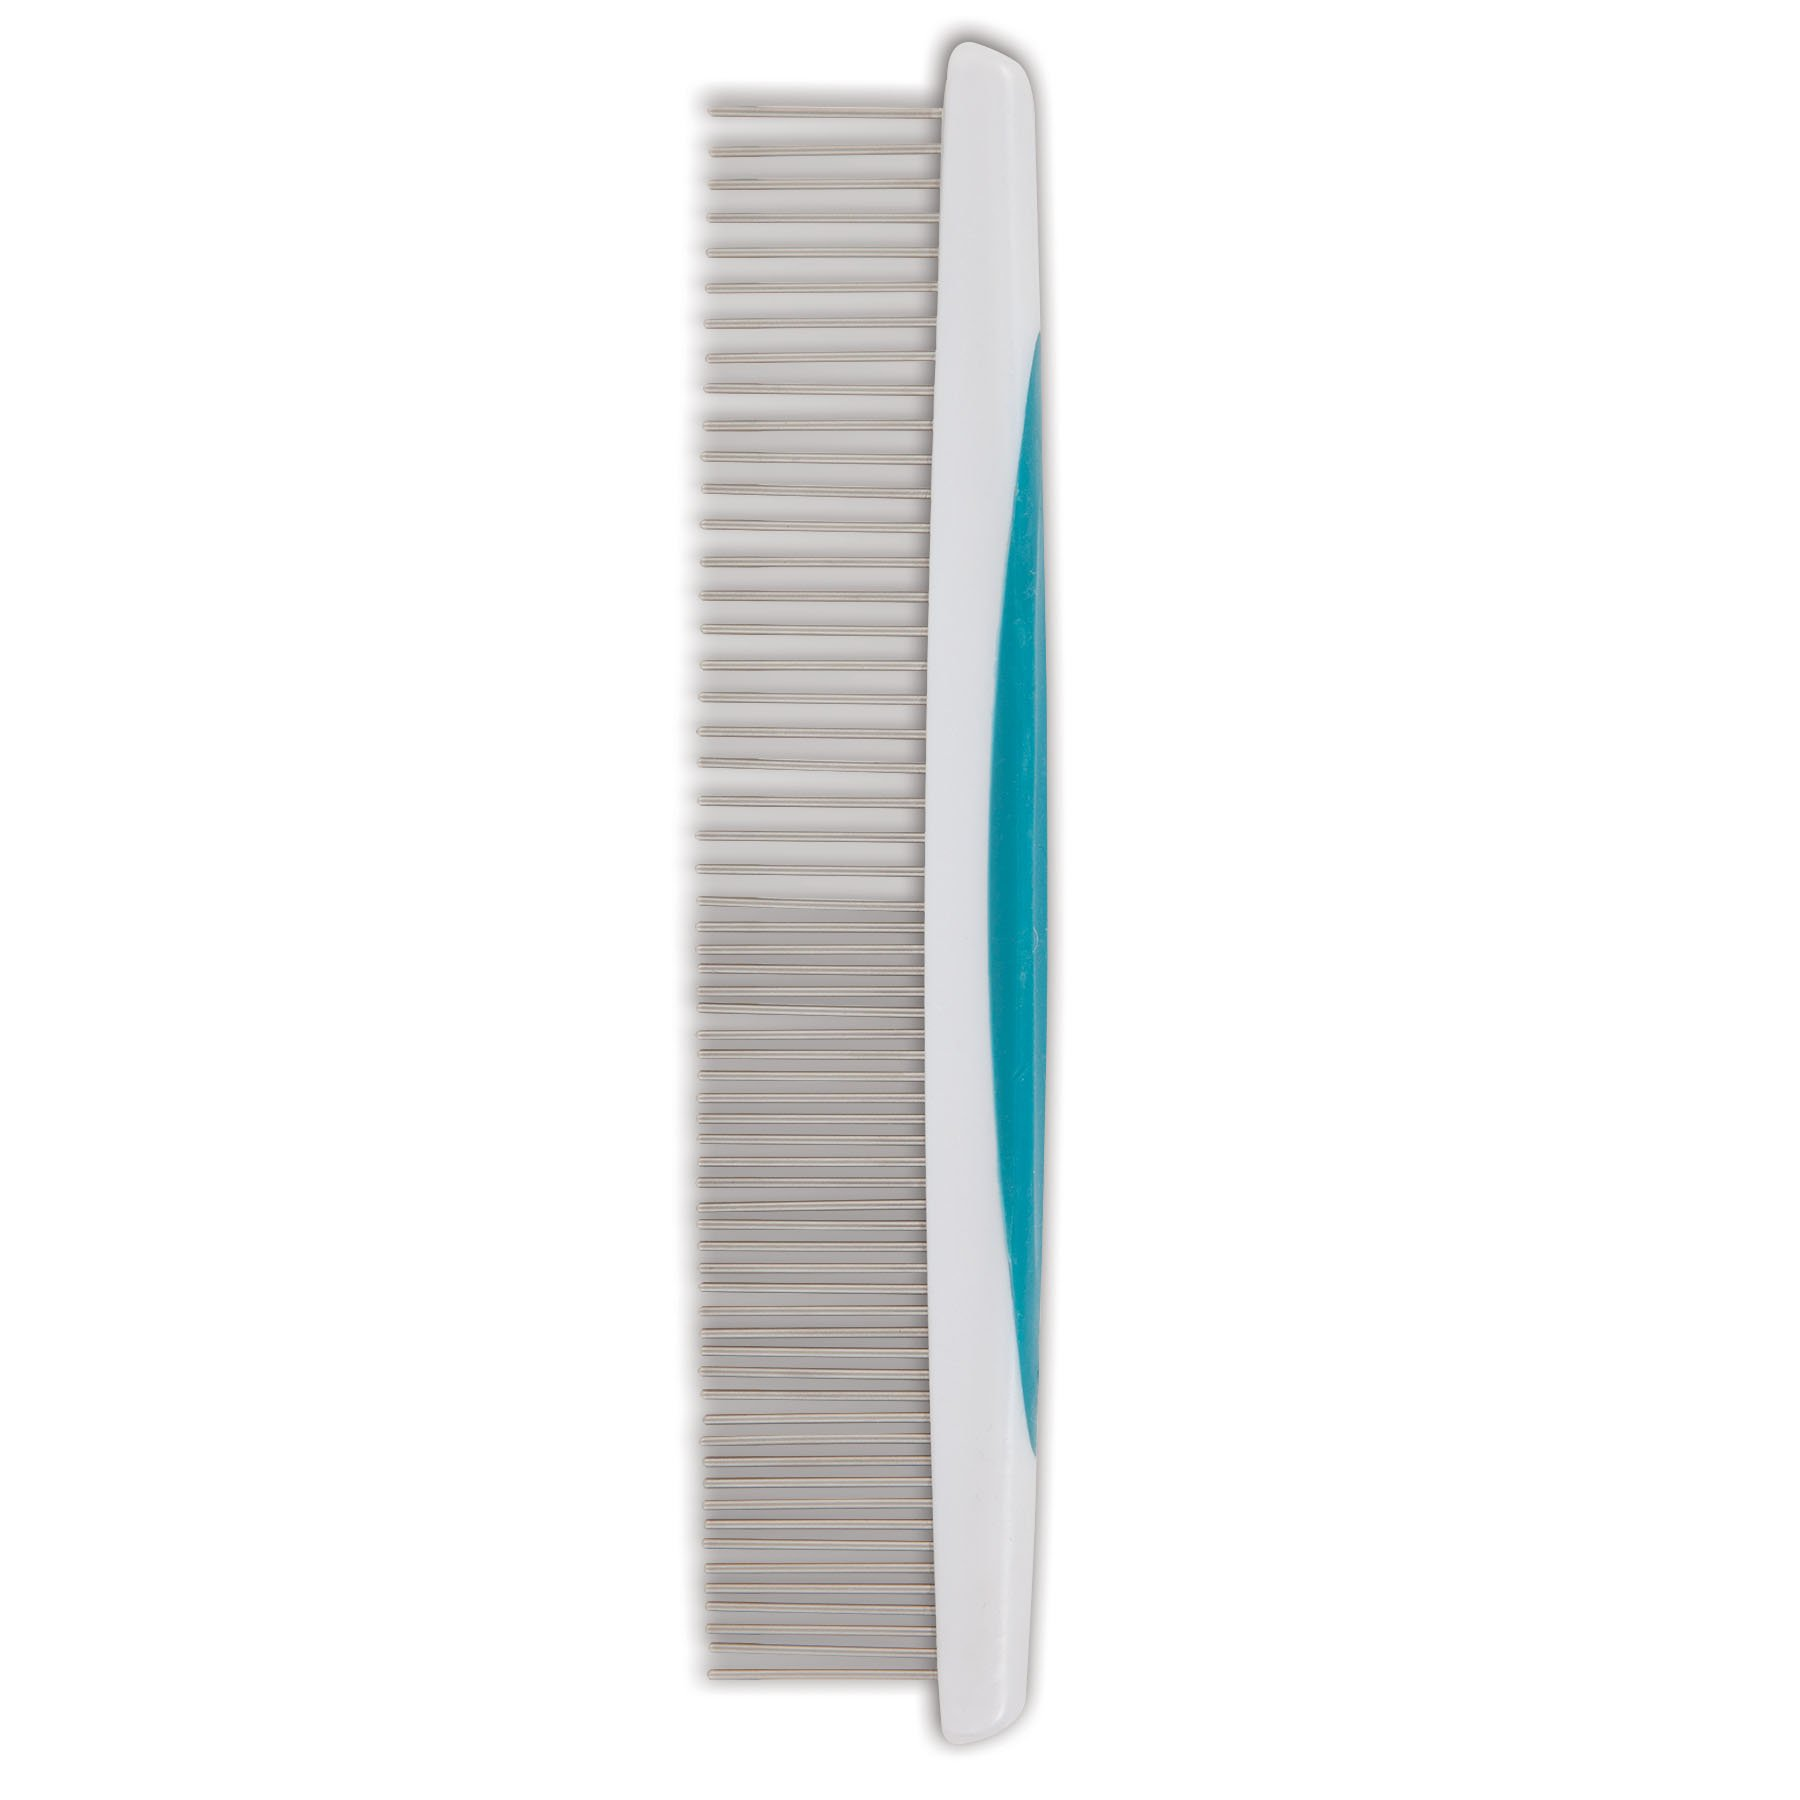 Petmate Furbuster Rotating Tooth Comb, Vibrant Plum